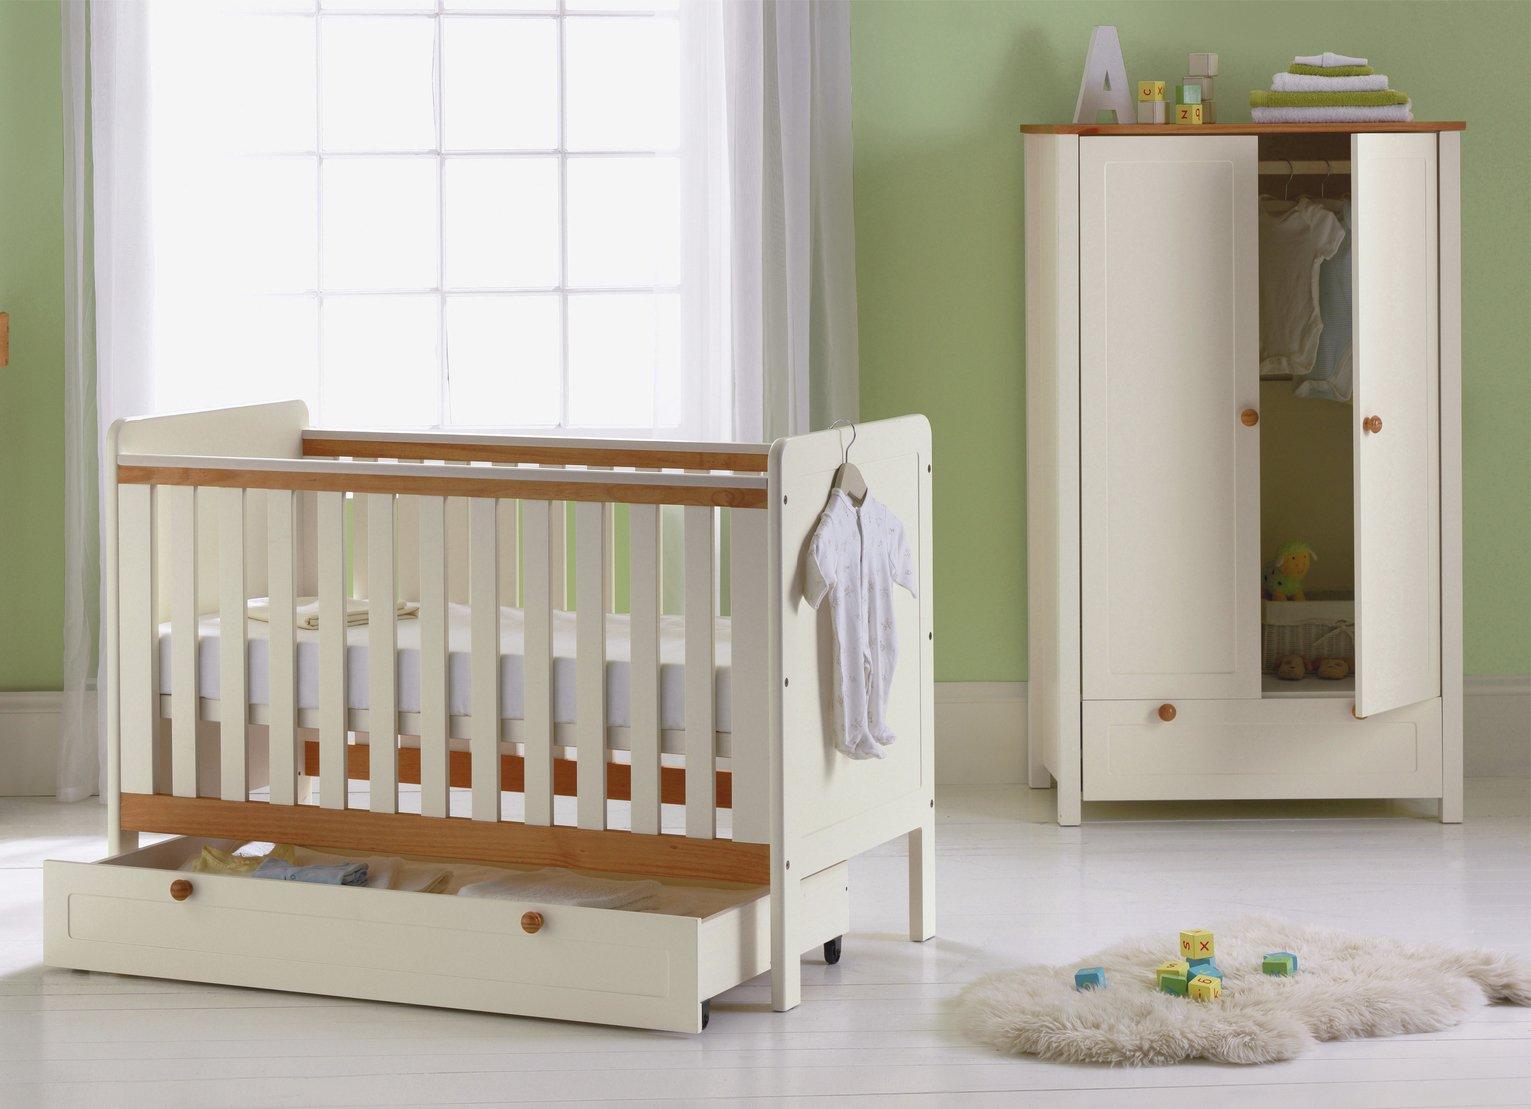 Image of Classic Two-Tone 3 Piece Nursery Furniture Set